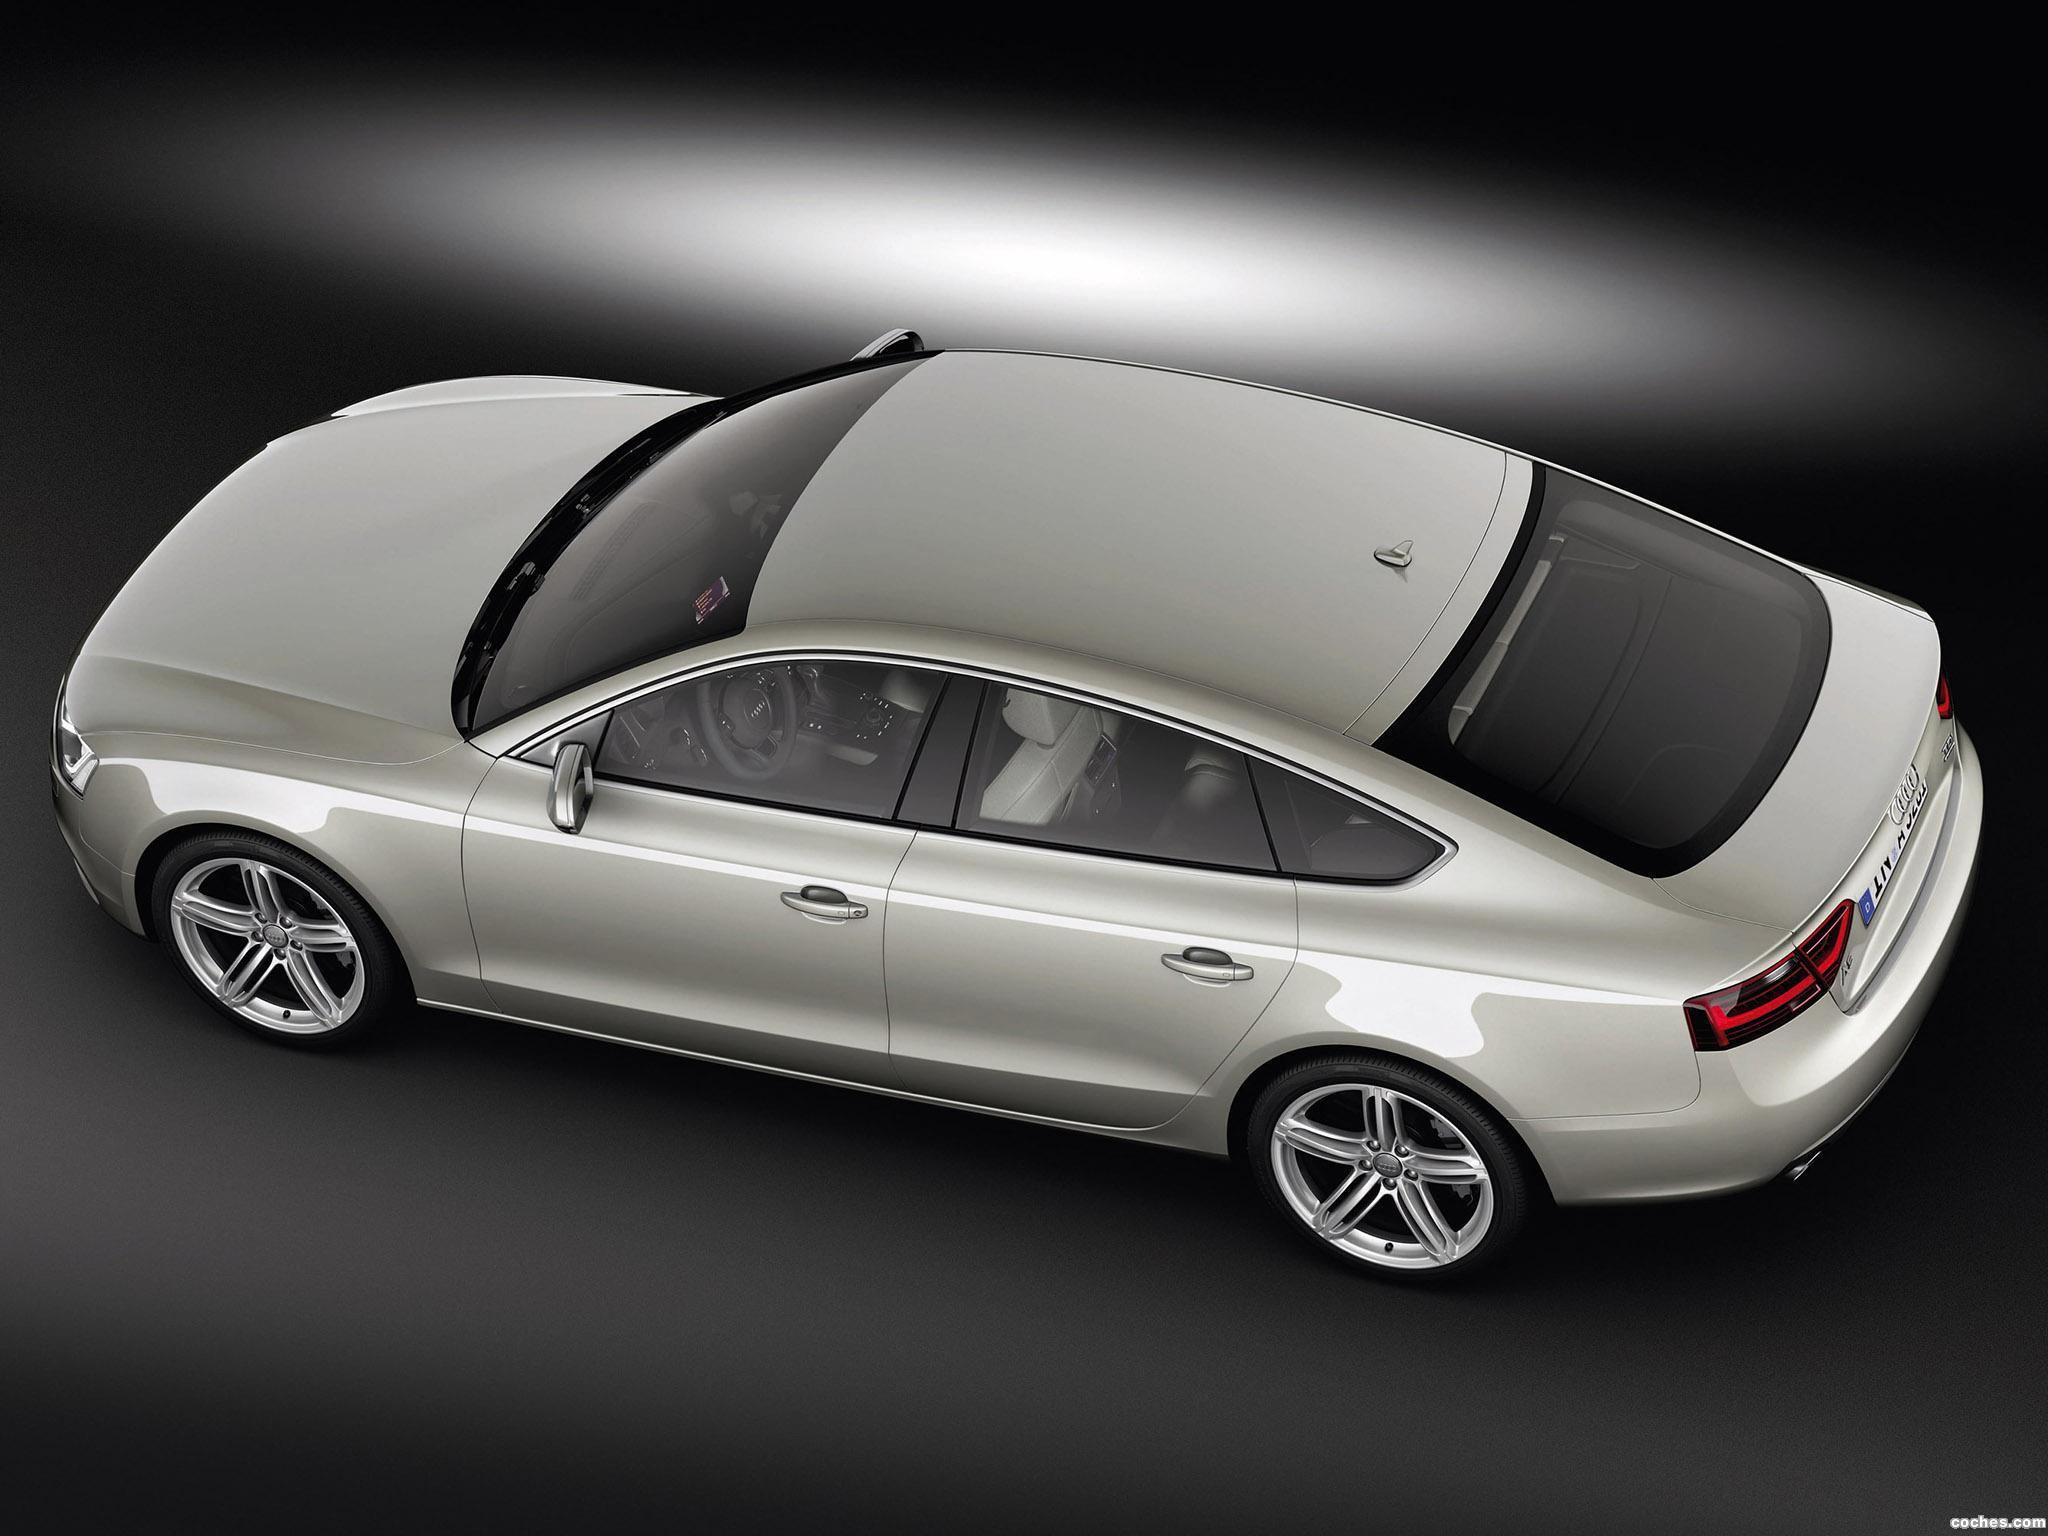 Foto 8 de Audi A5 Sportback 2011